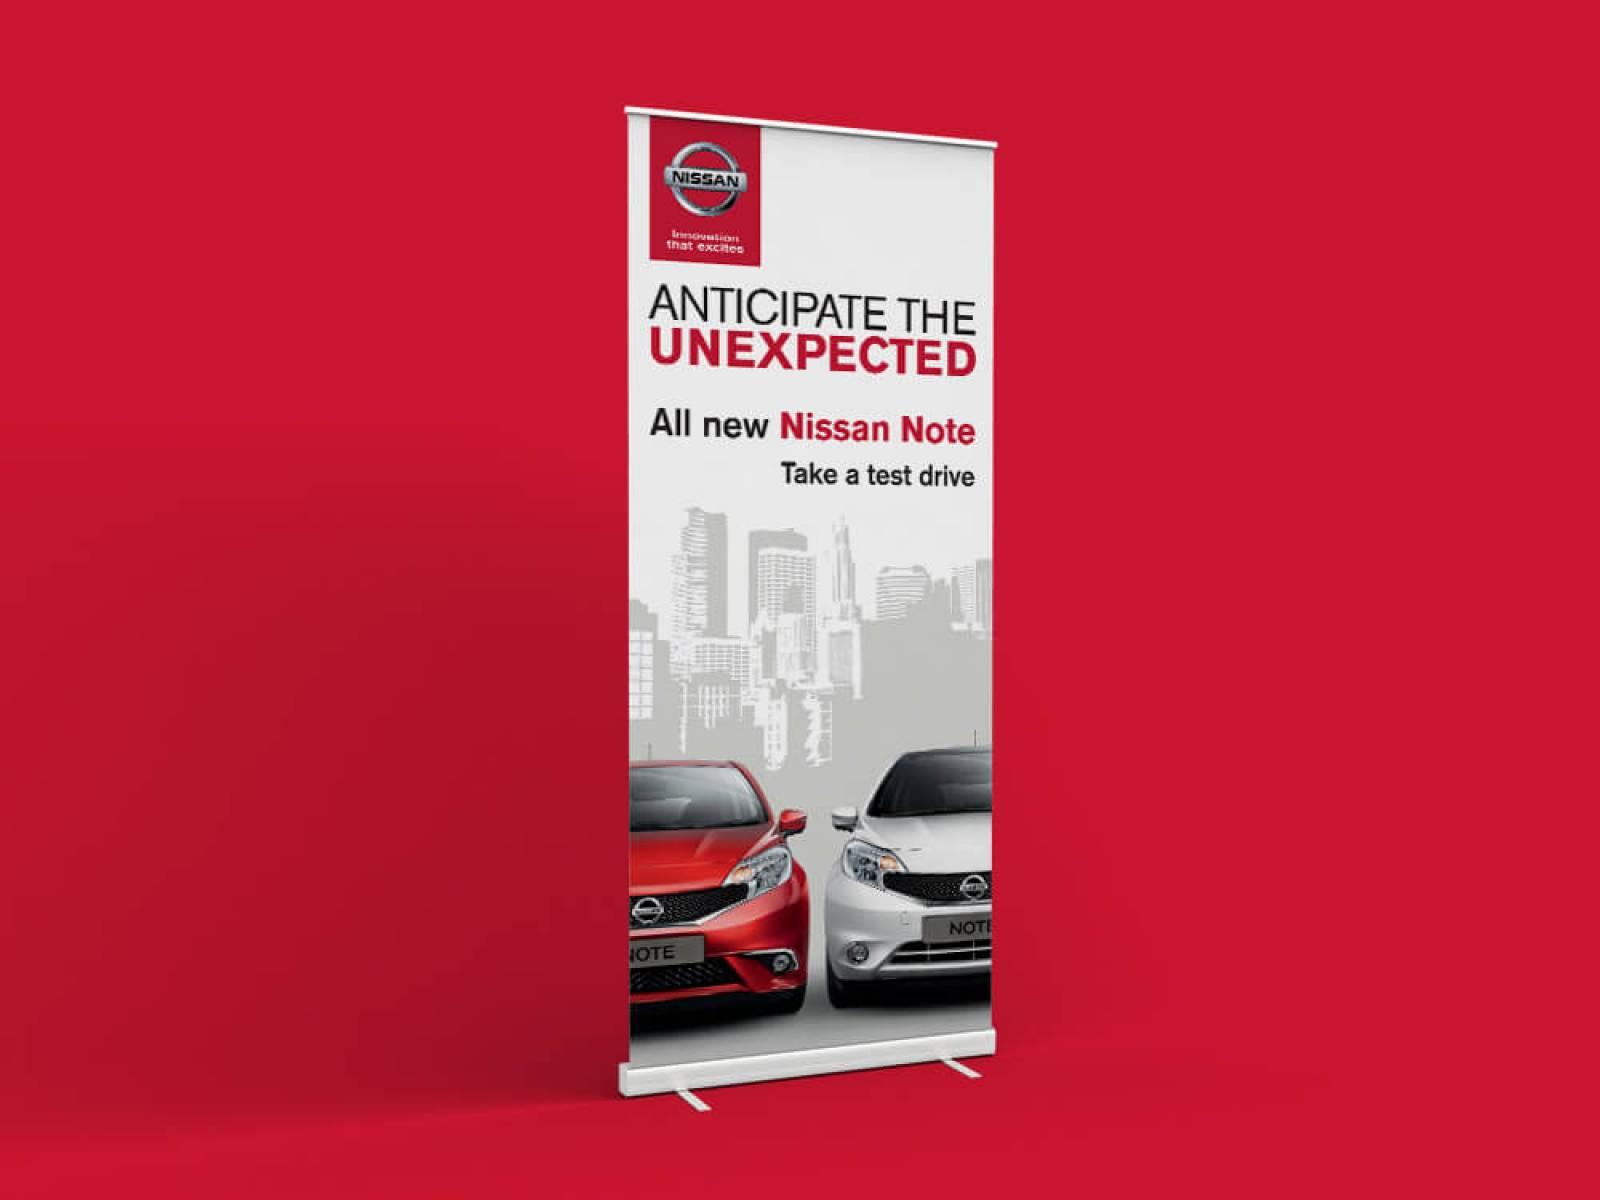 Exhibition-Nissan-banner-design-agency-graphic-design-canterbury-03.jpg